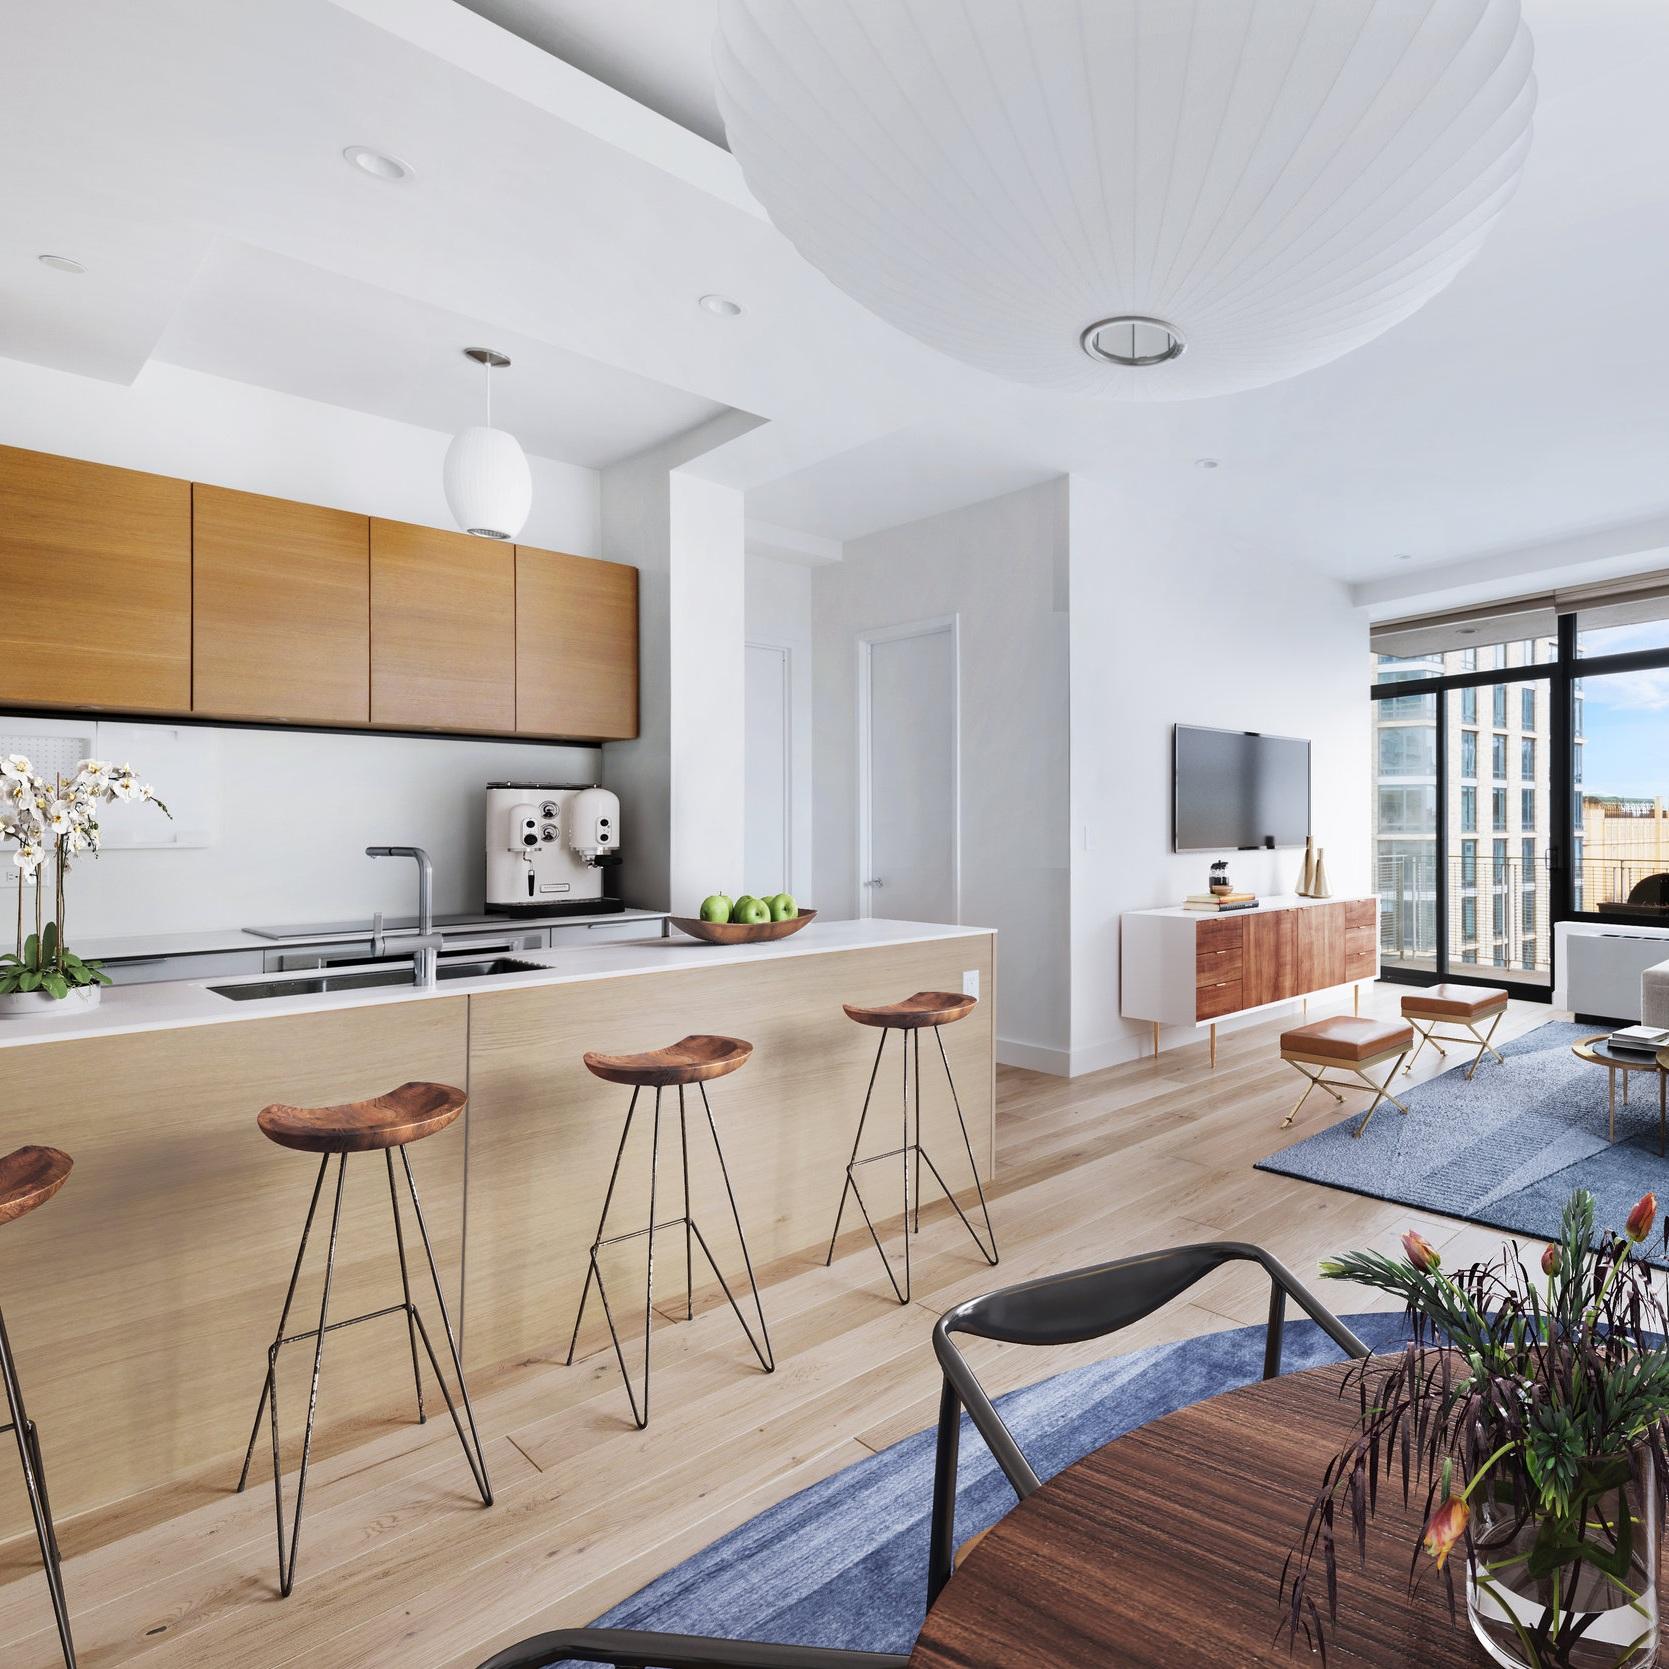 Bolster+Smart+Renovation+Henrybuilt+Kitchen+andliving+room.jpg